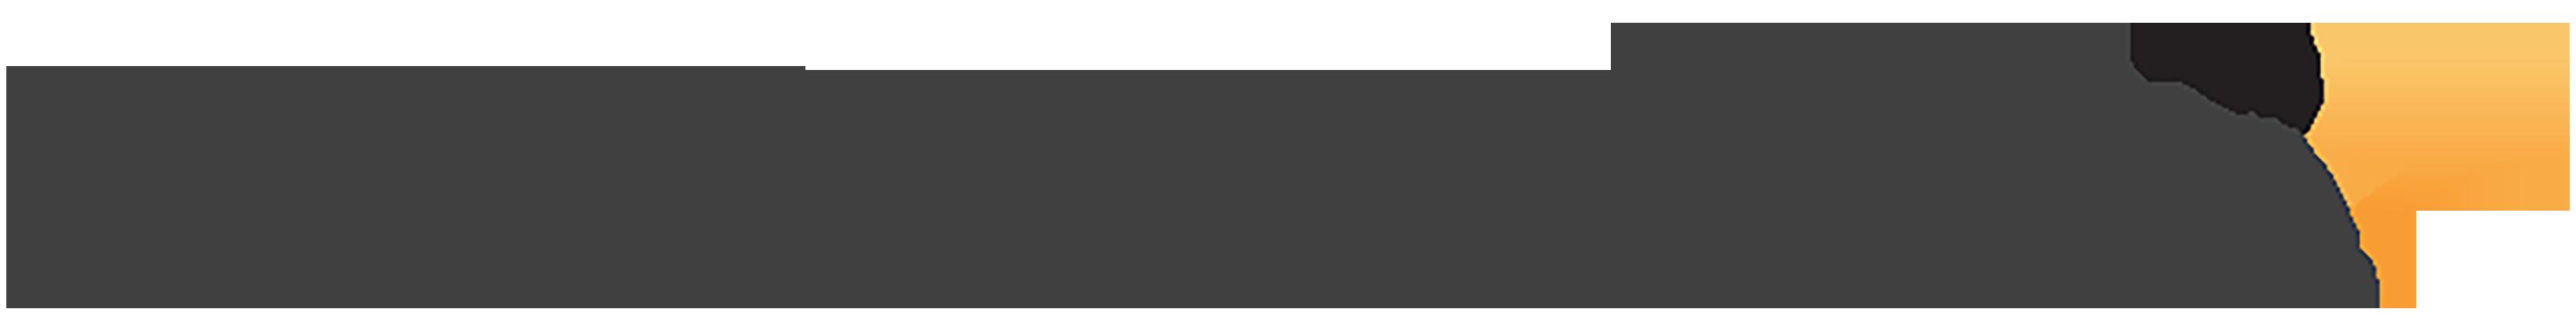 software-advice-logo_copy